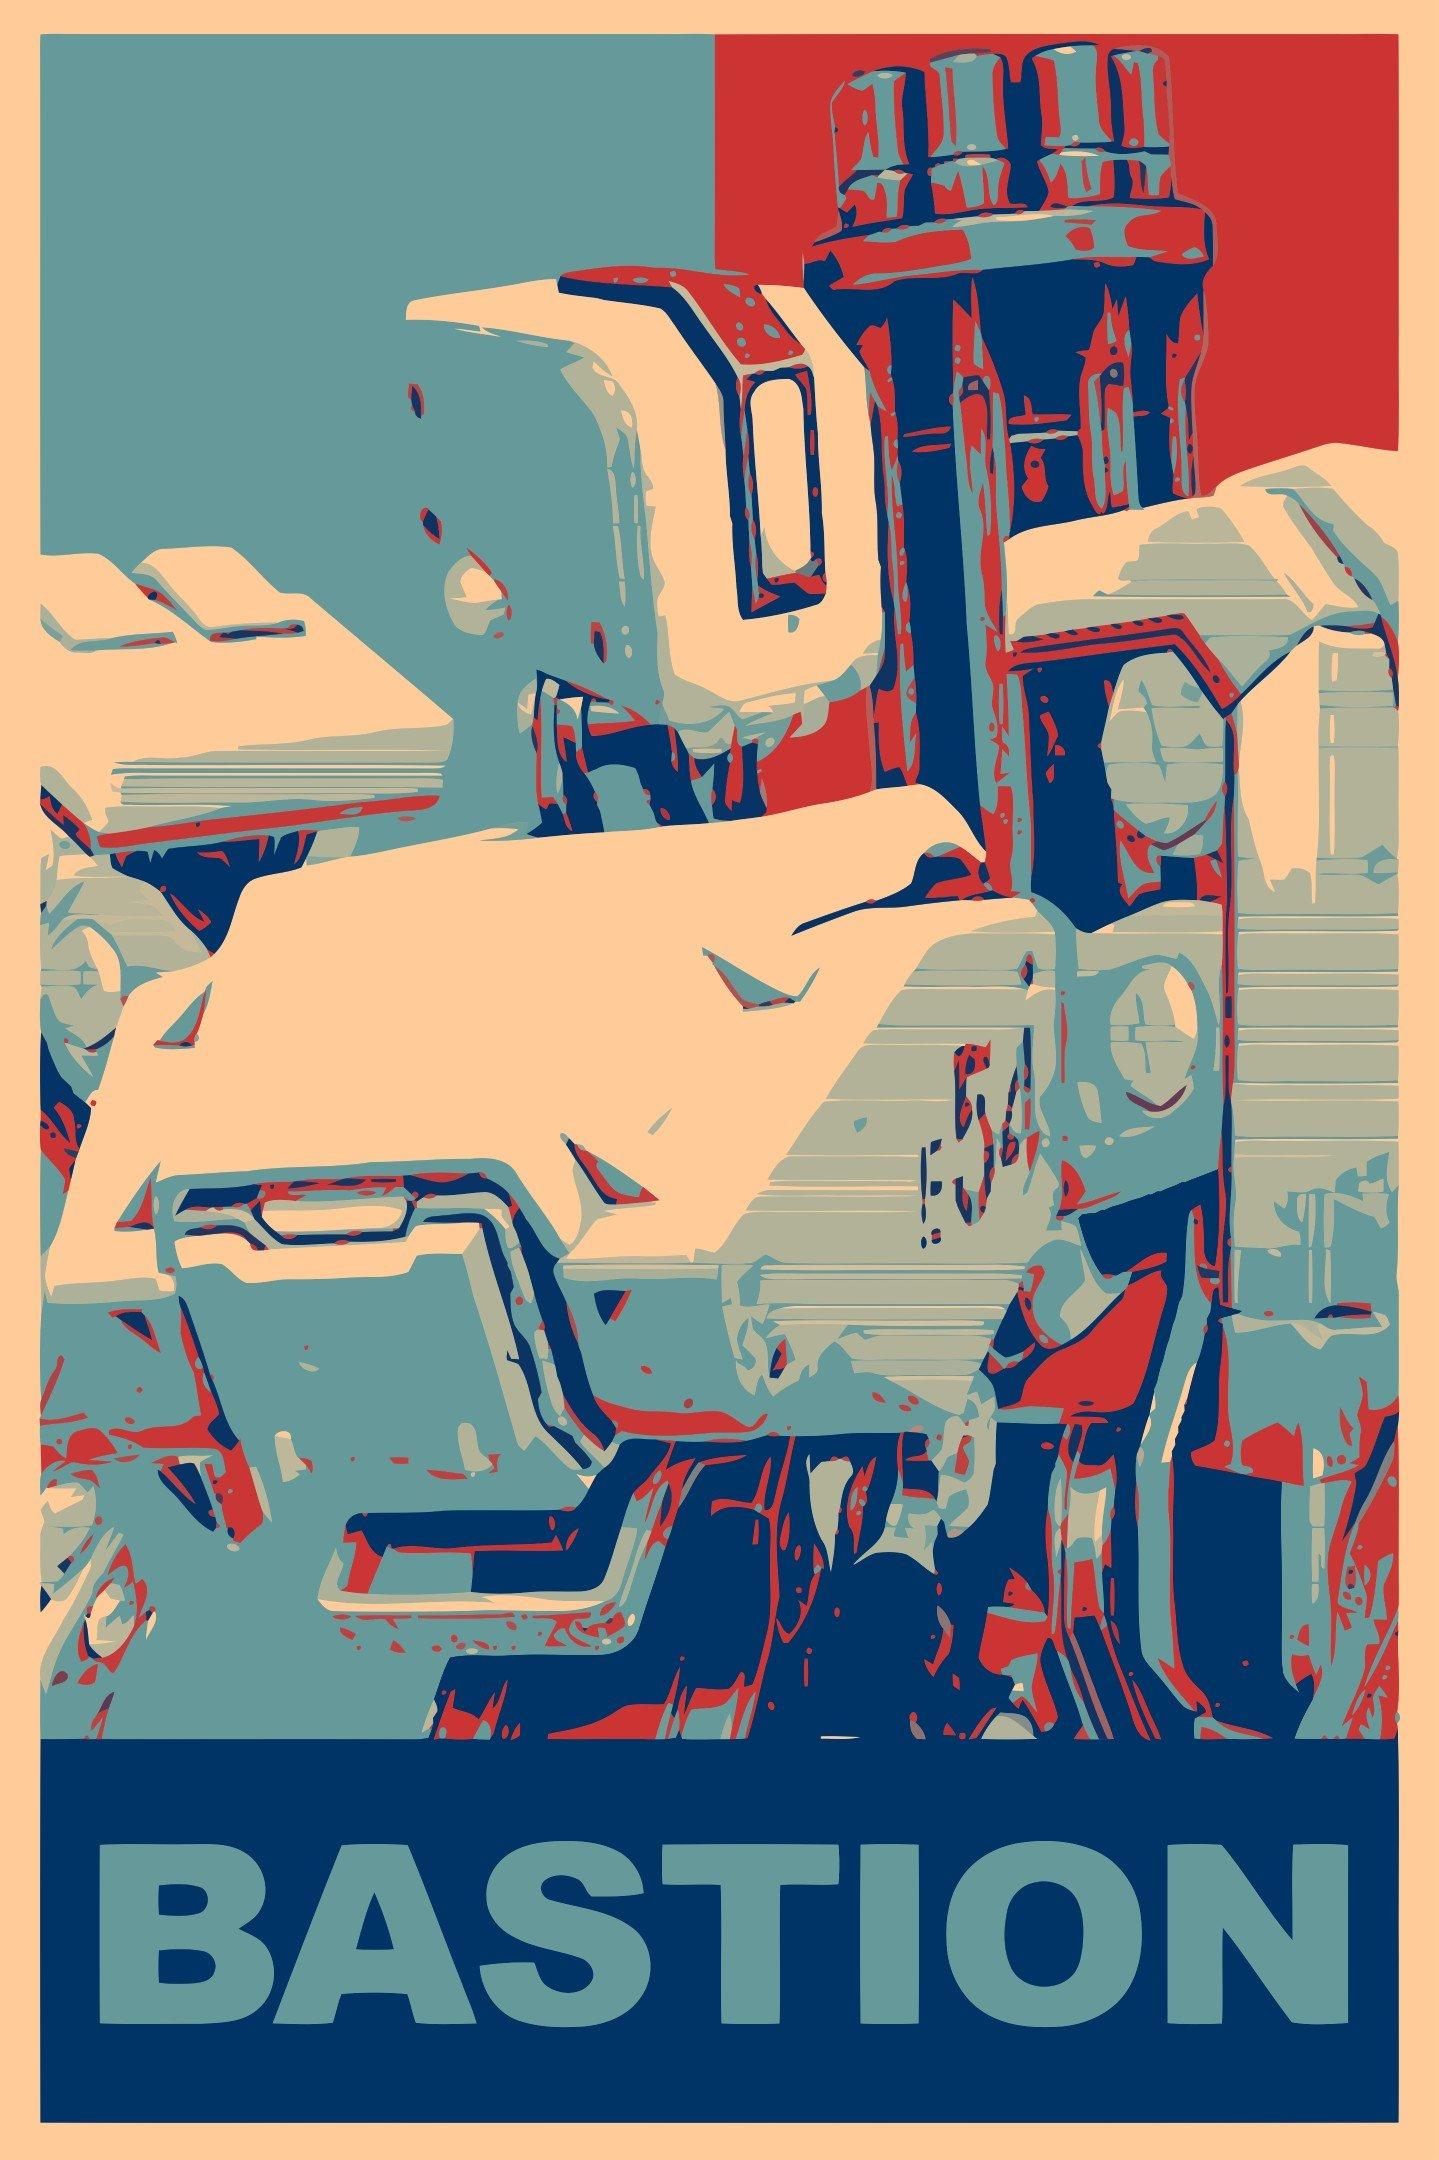 Bastion (Overwatch), Propaganda, Overwatch, Gamer Wallpaper